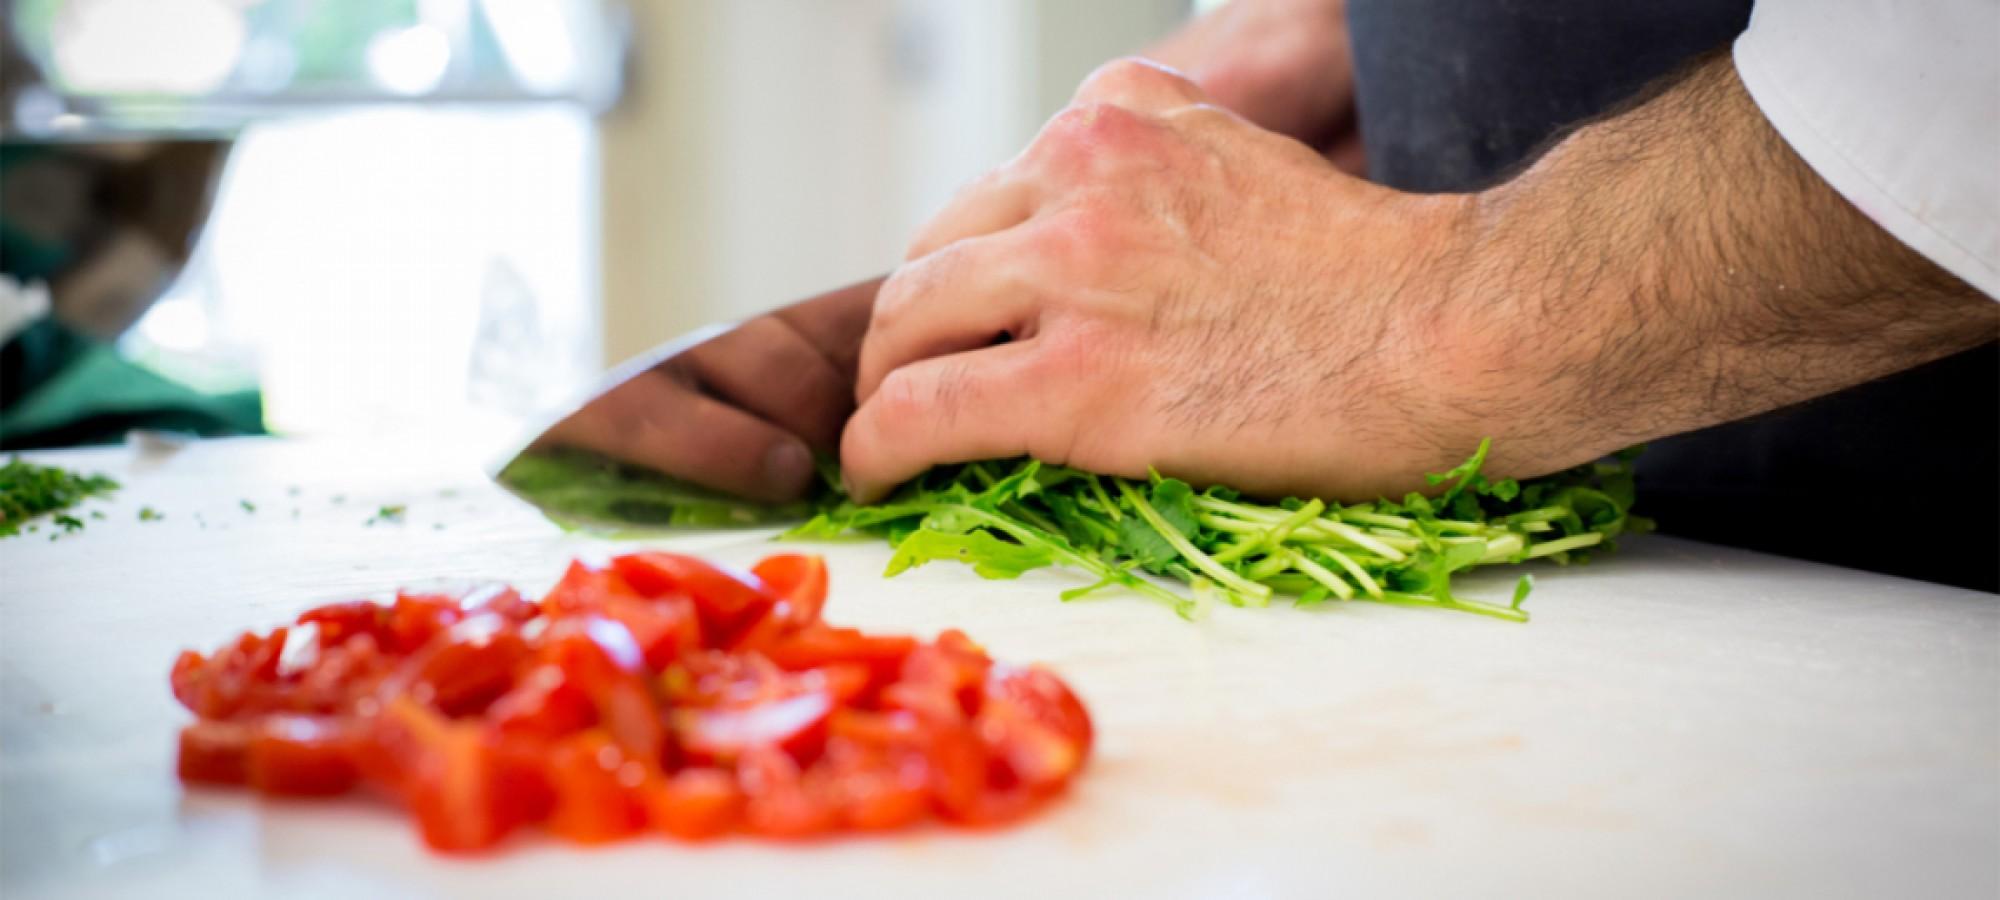 Cucina stagionale - Lago di Oz - Food & Soul